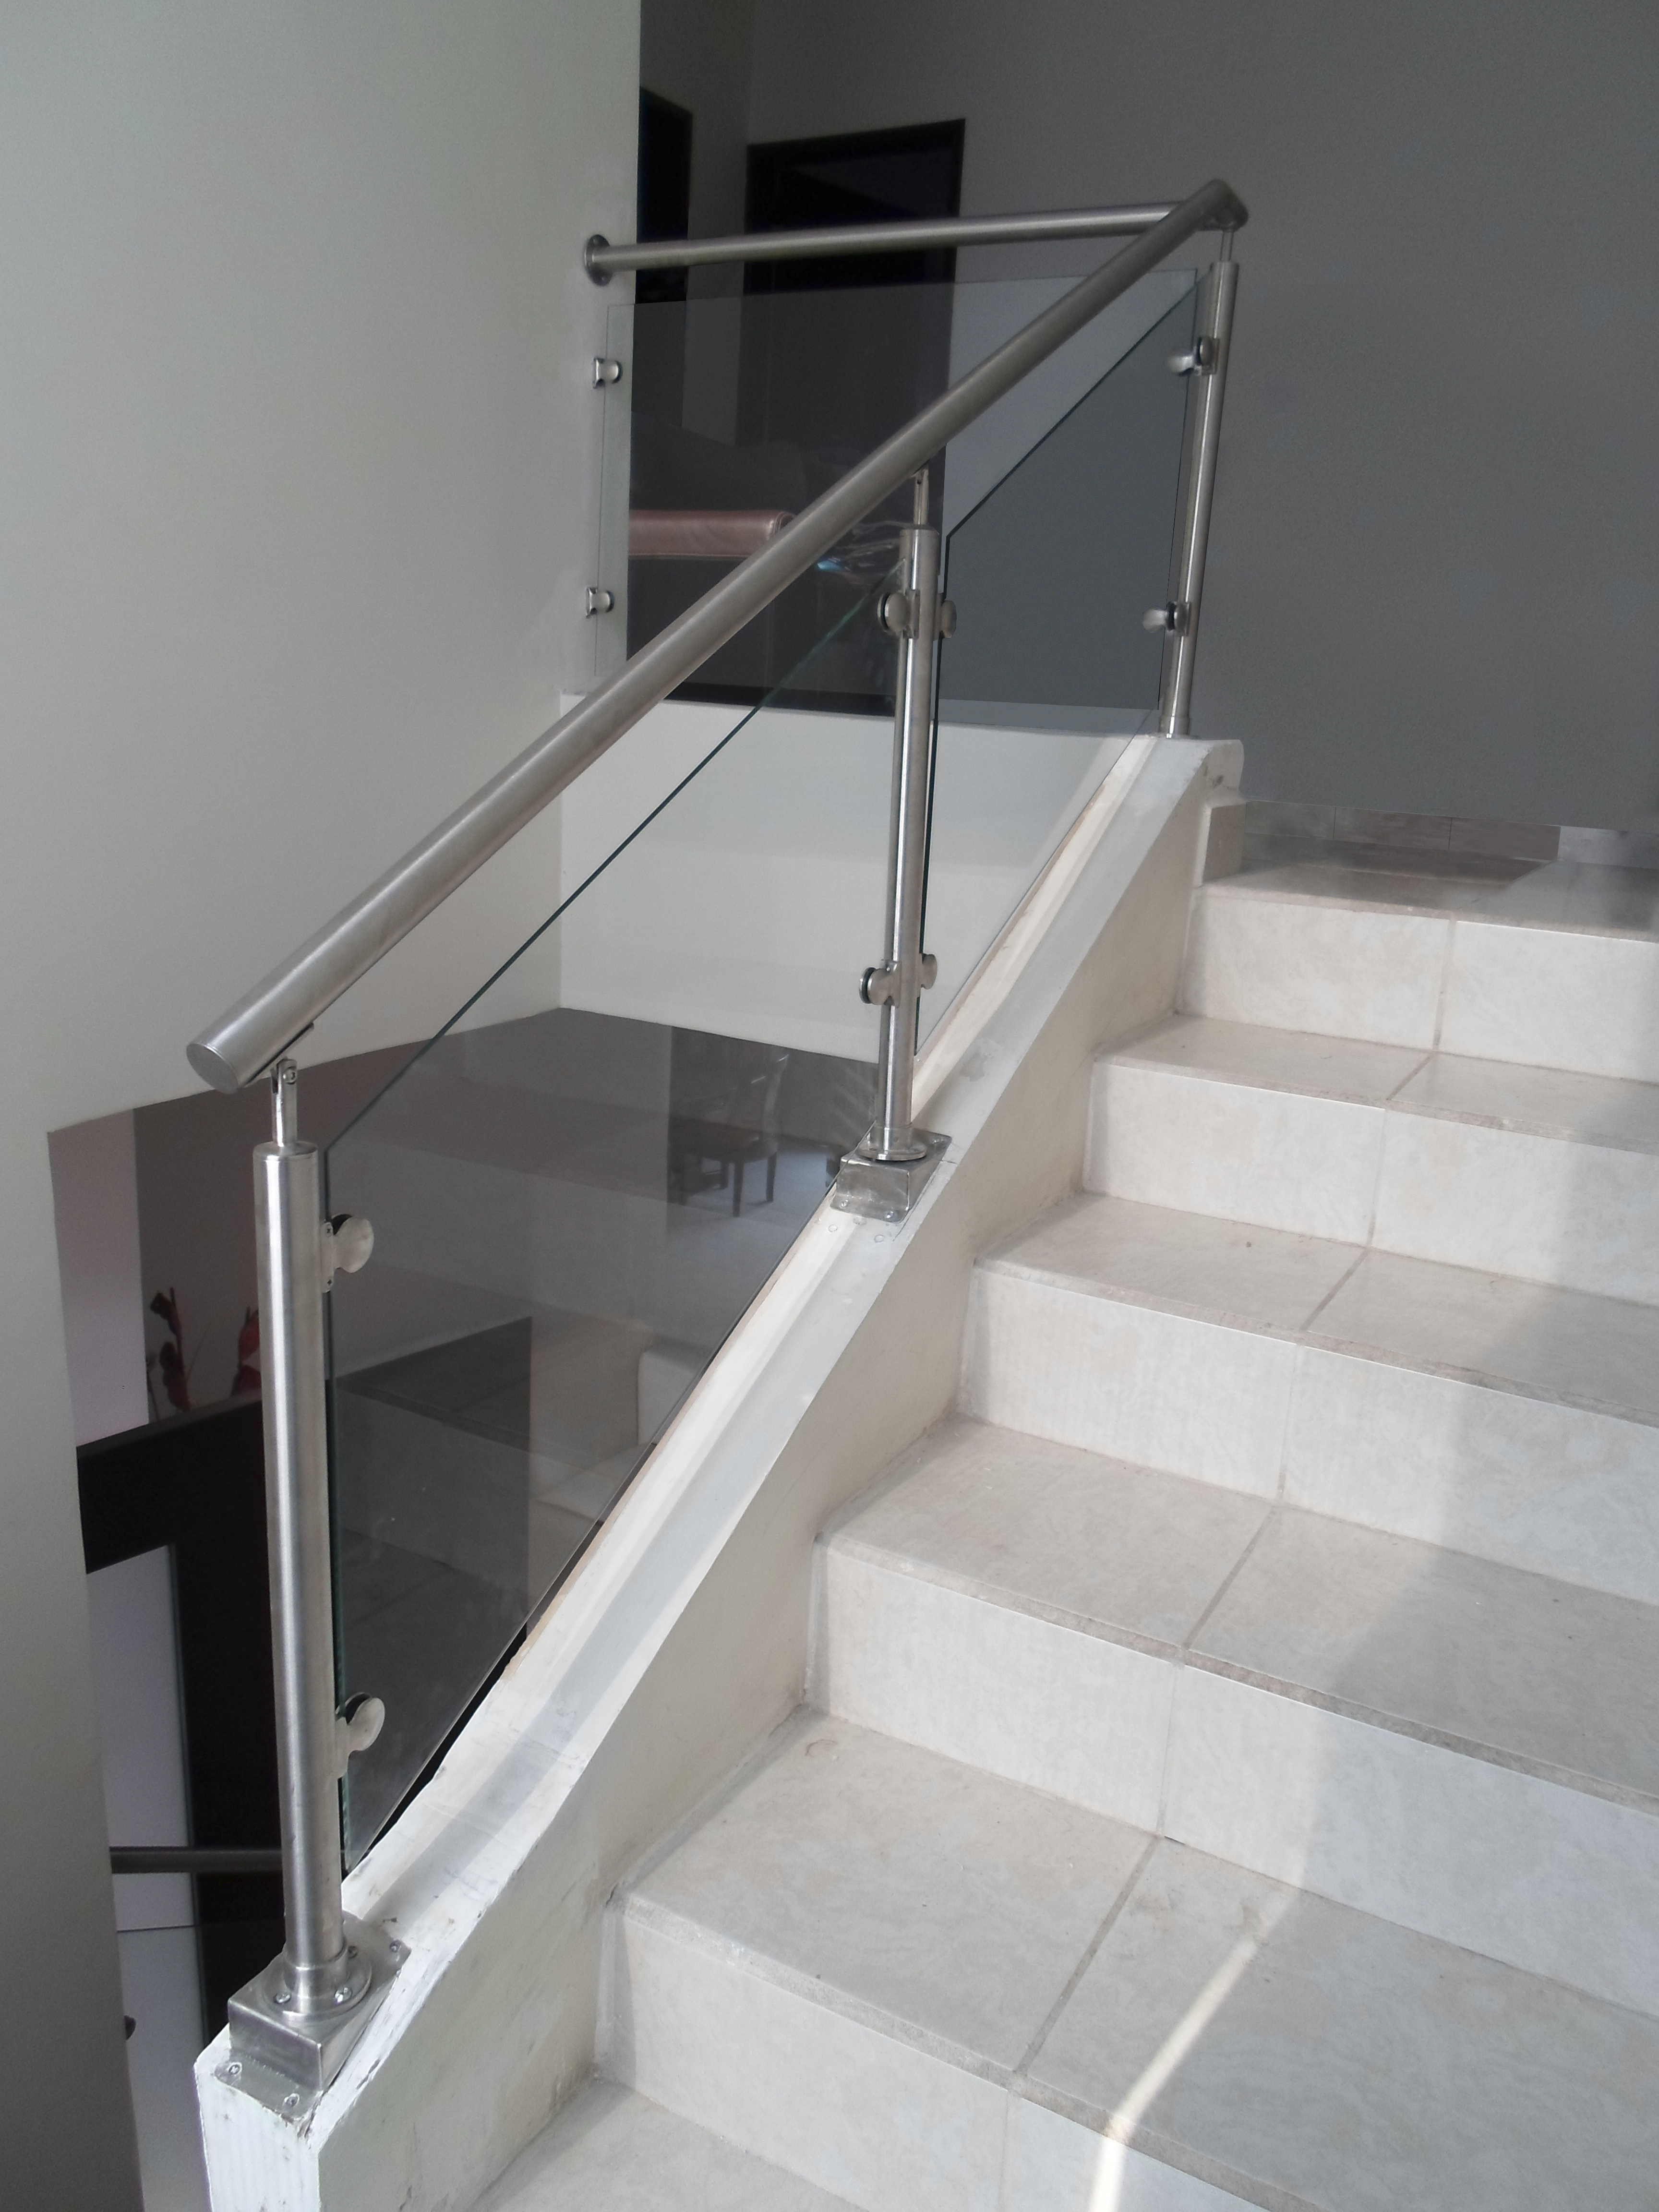 Pin barandales cristal templado genuardis portal on pinterest - Barandales de escaleras ...